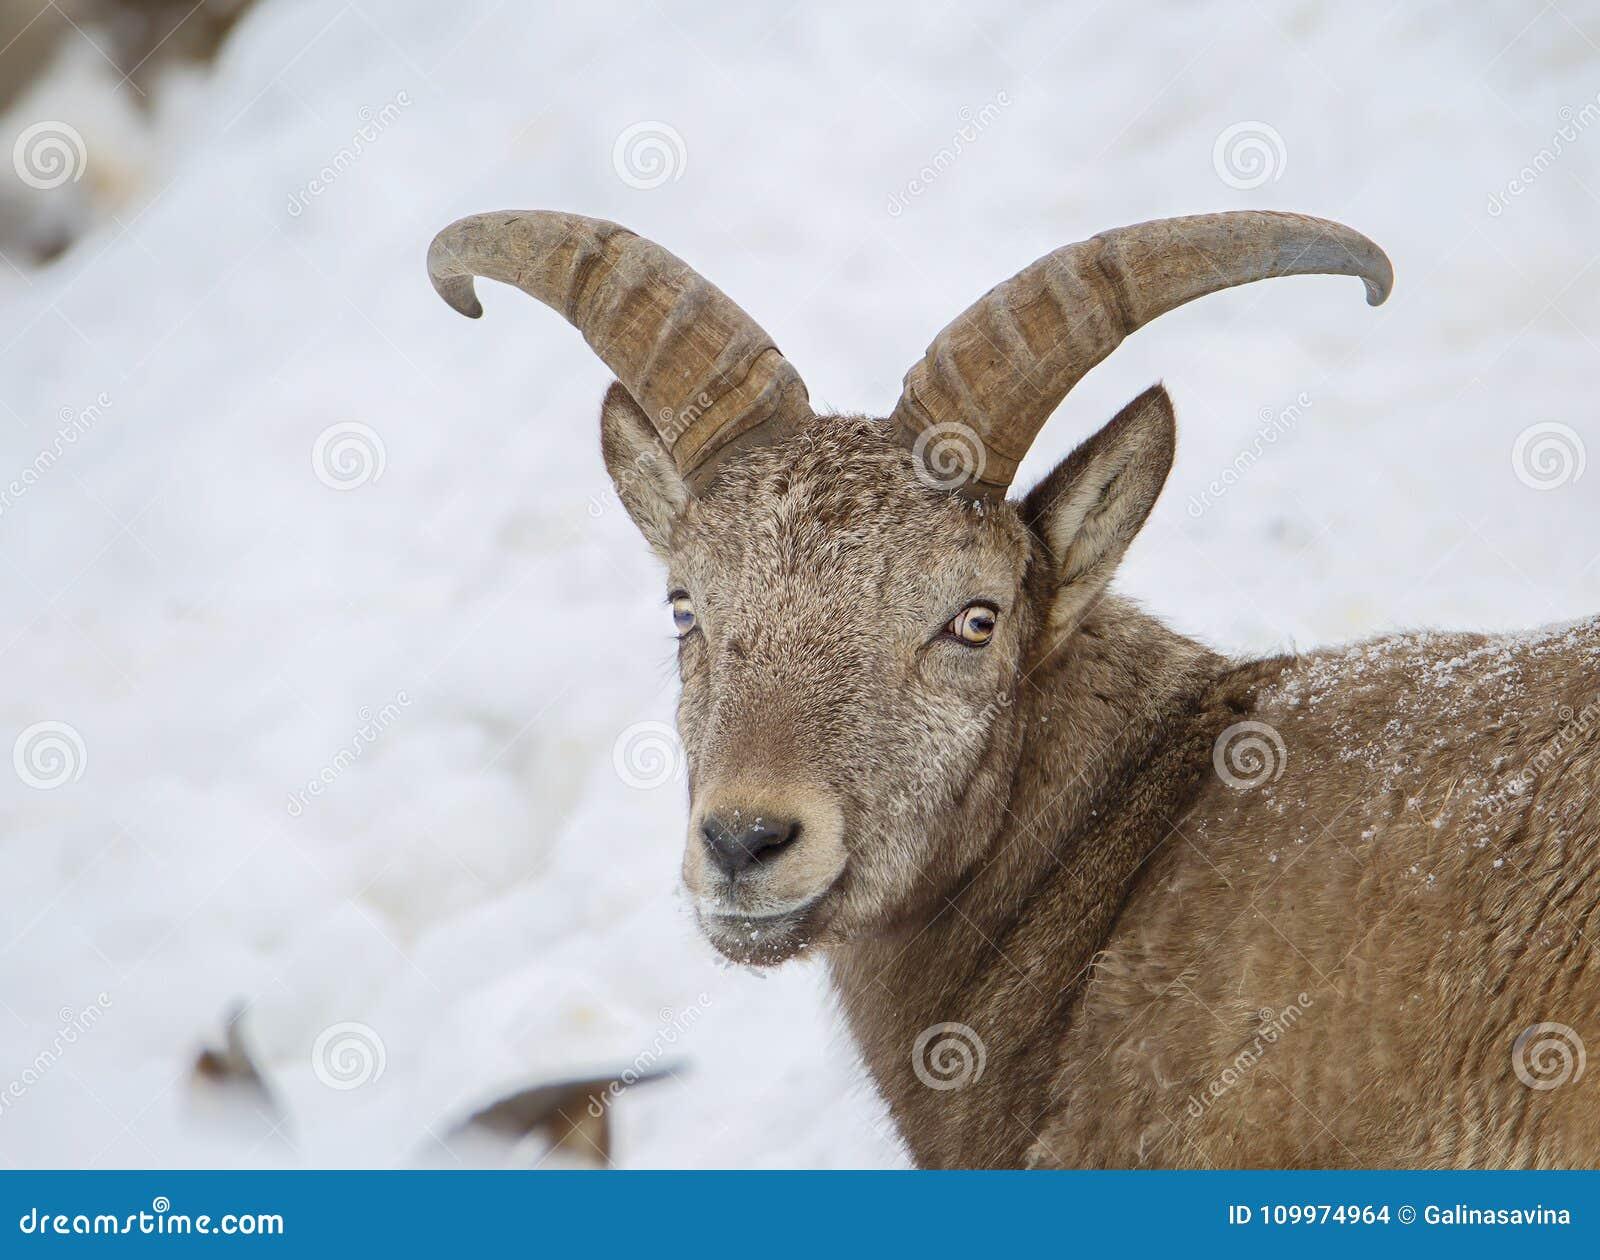 Pity, asian mountain goat